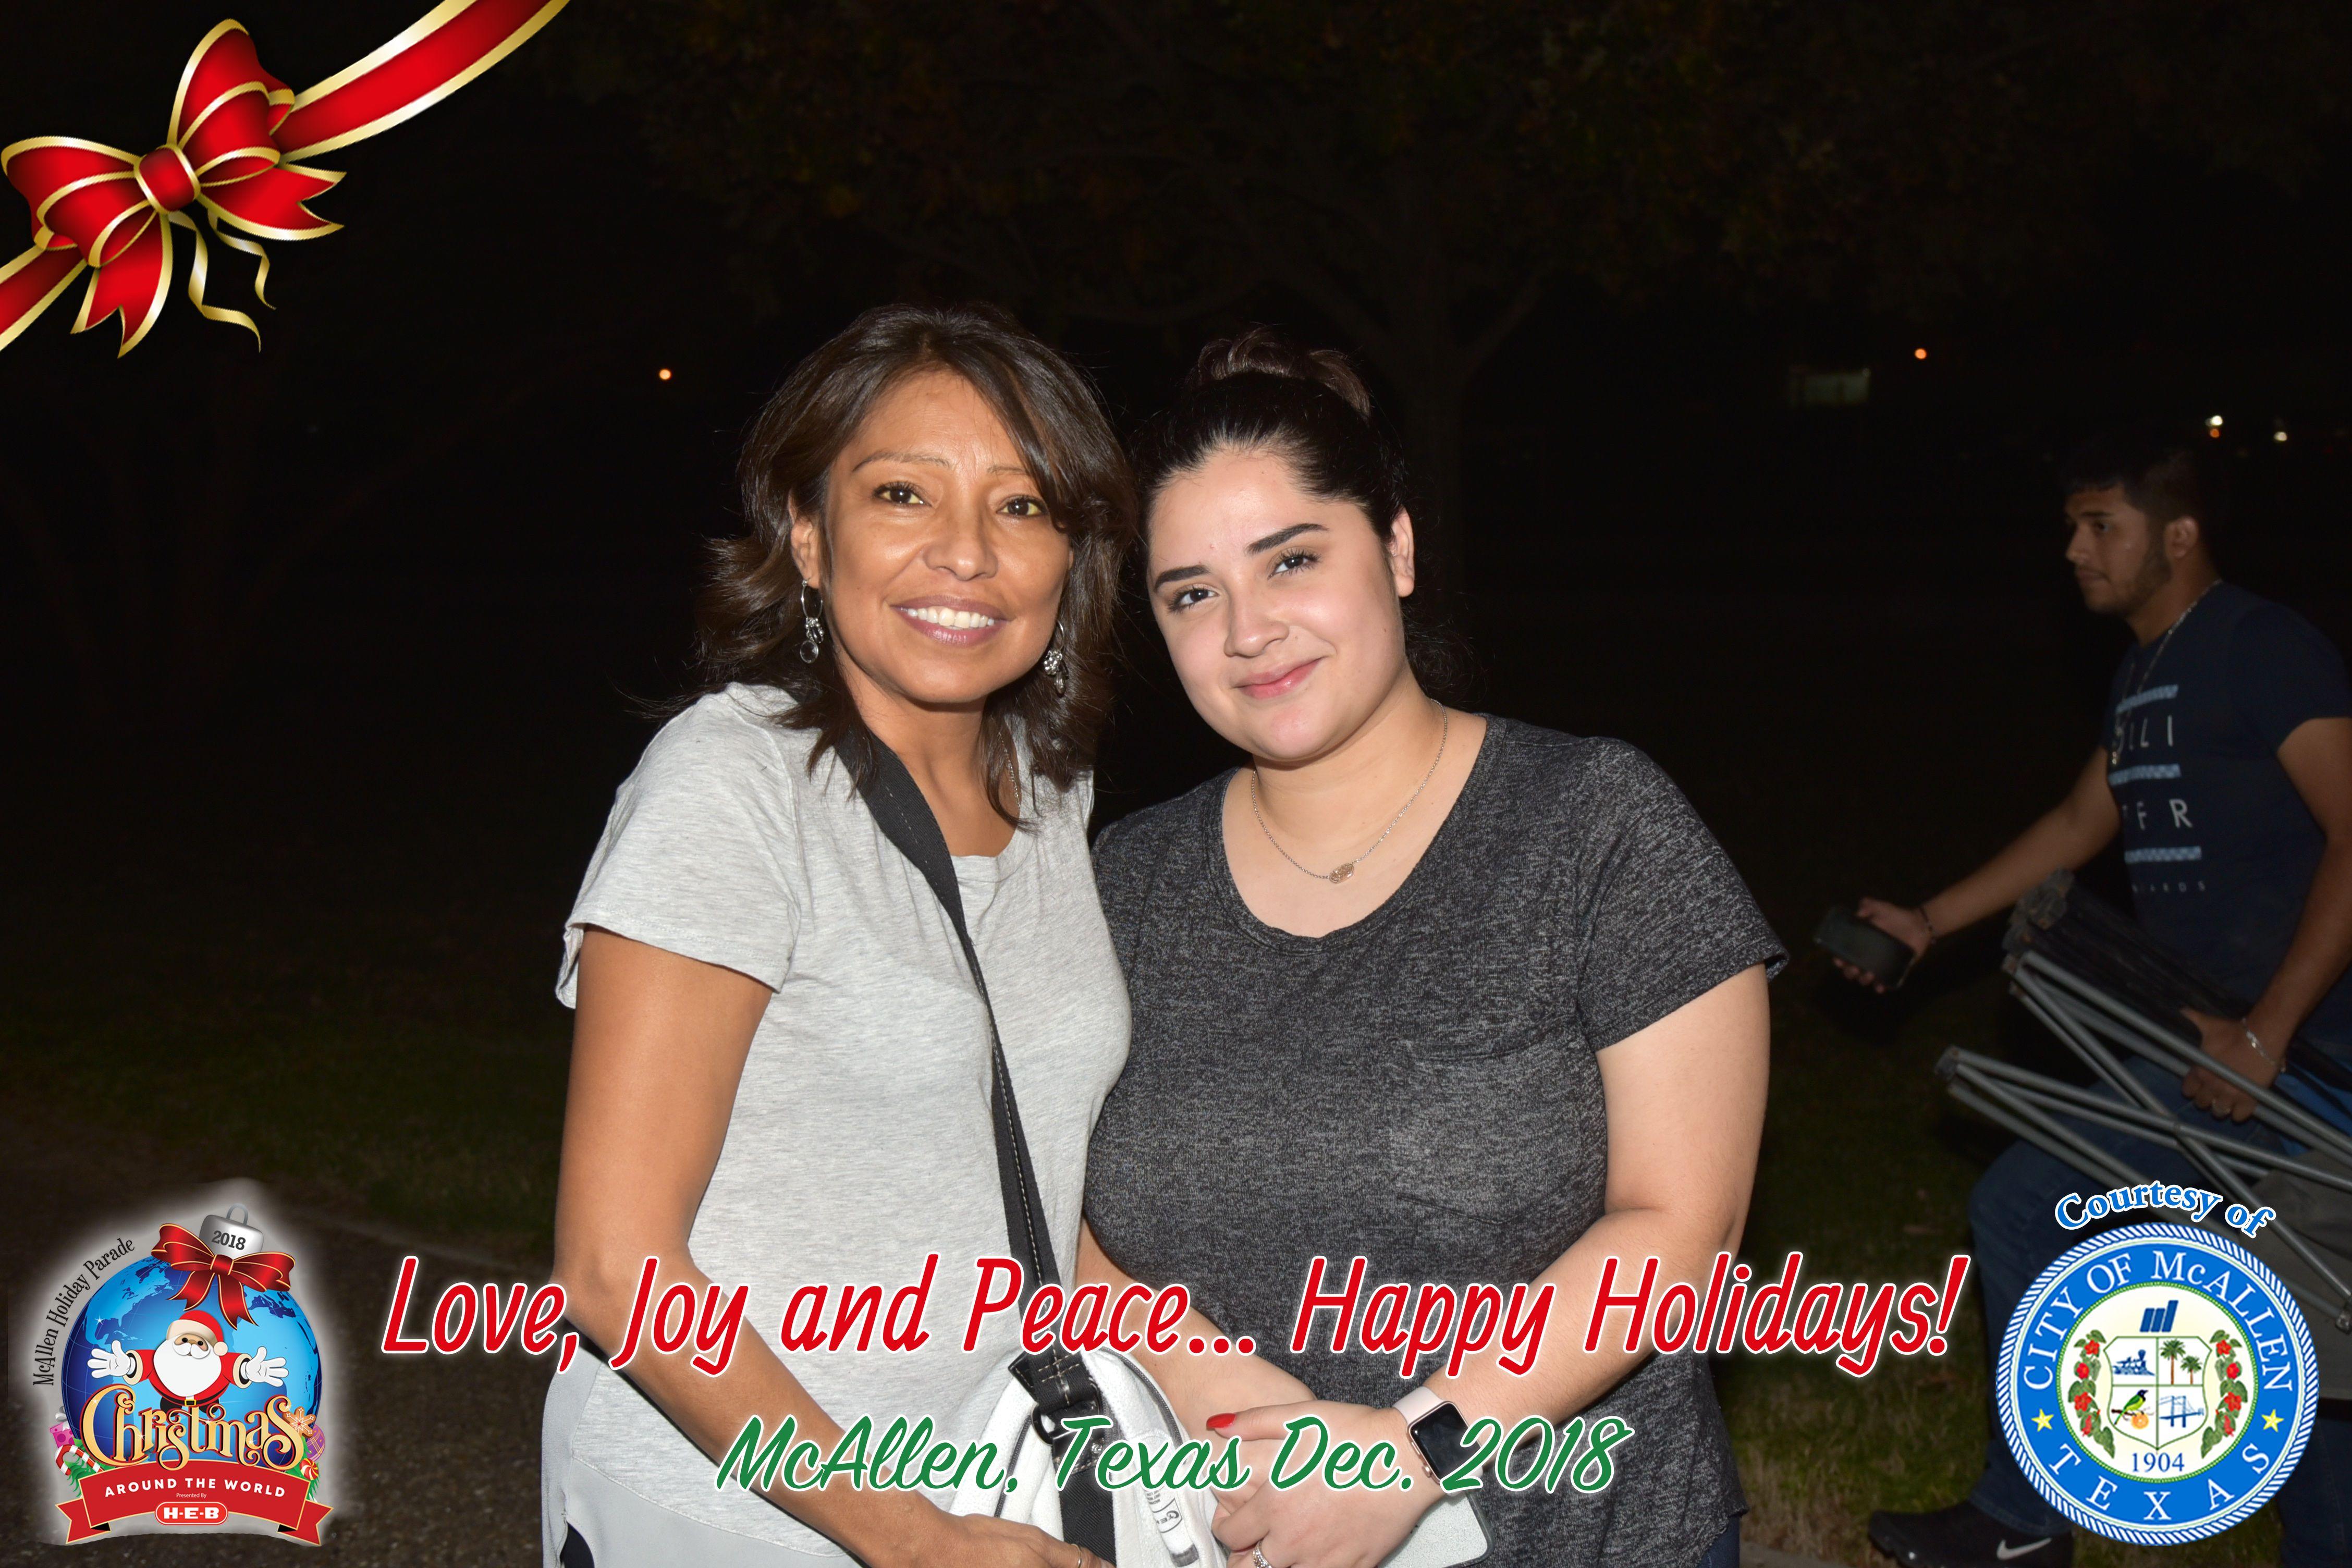 McAllen Holiday Parade 2018 — Part 8